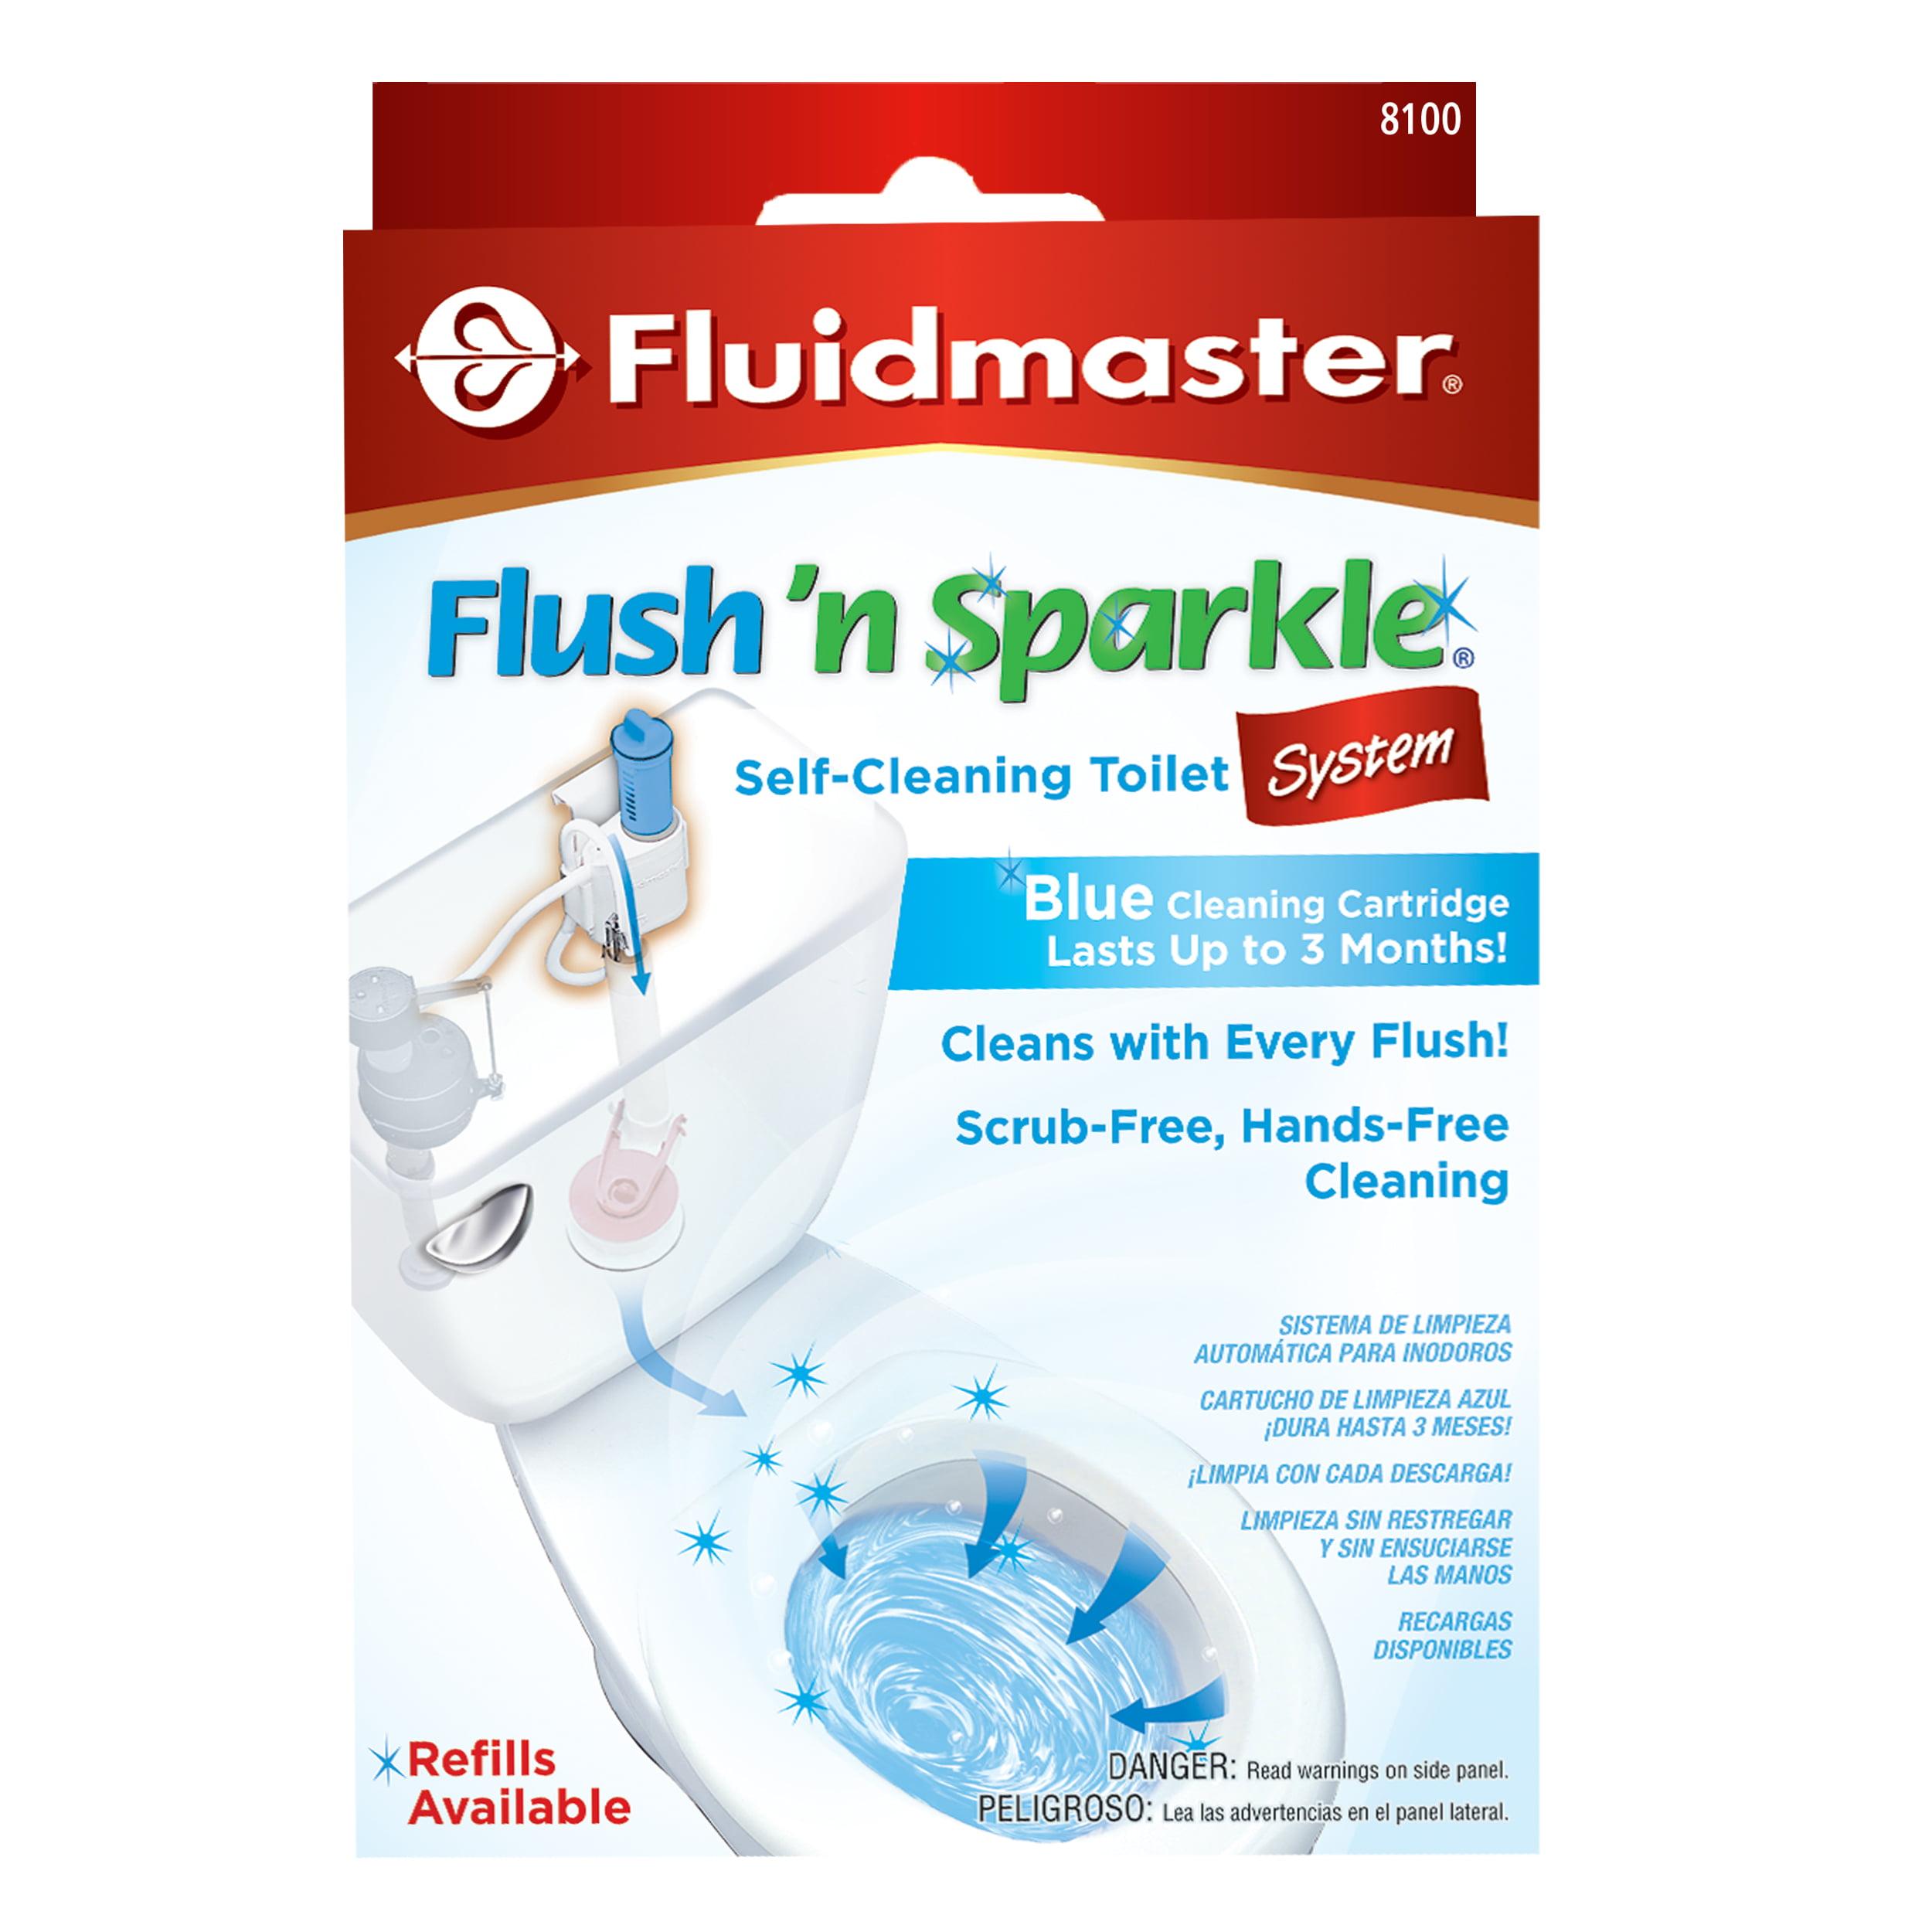 Fluidmaster® 8100P8 Flush 'n Sparkle® Automatic Blue Toilet Bowl Cleaning System